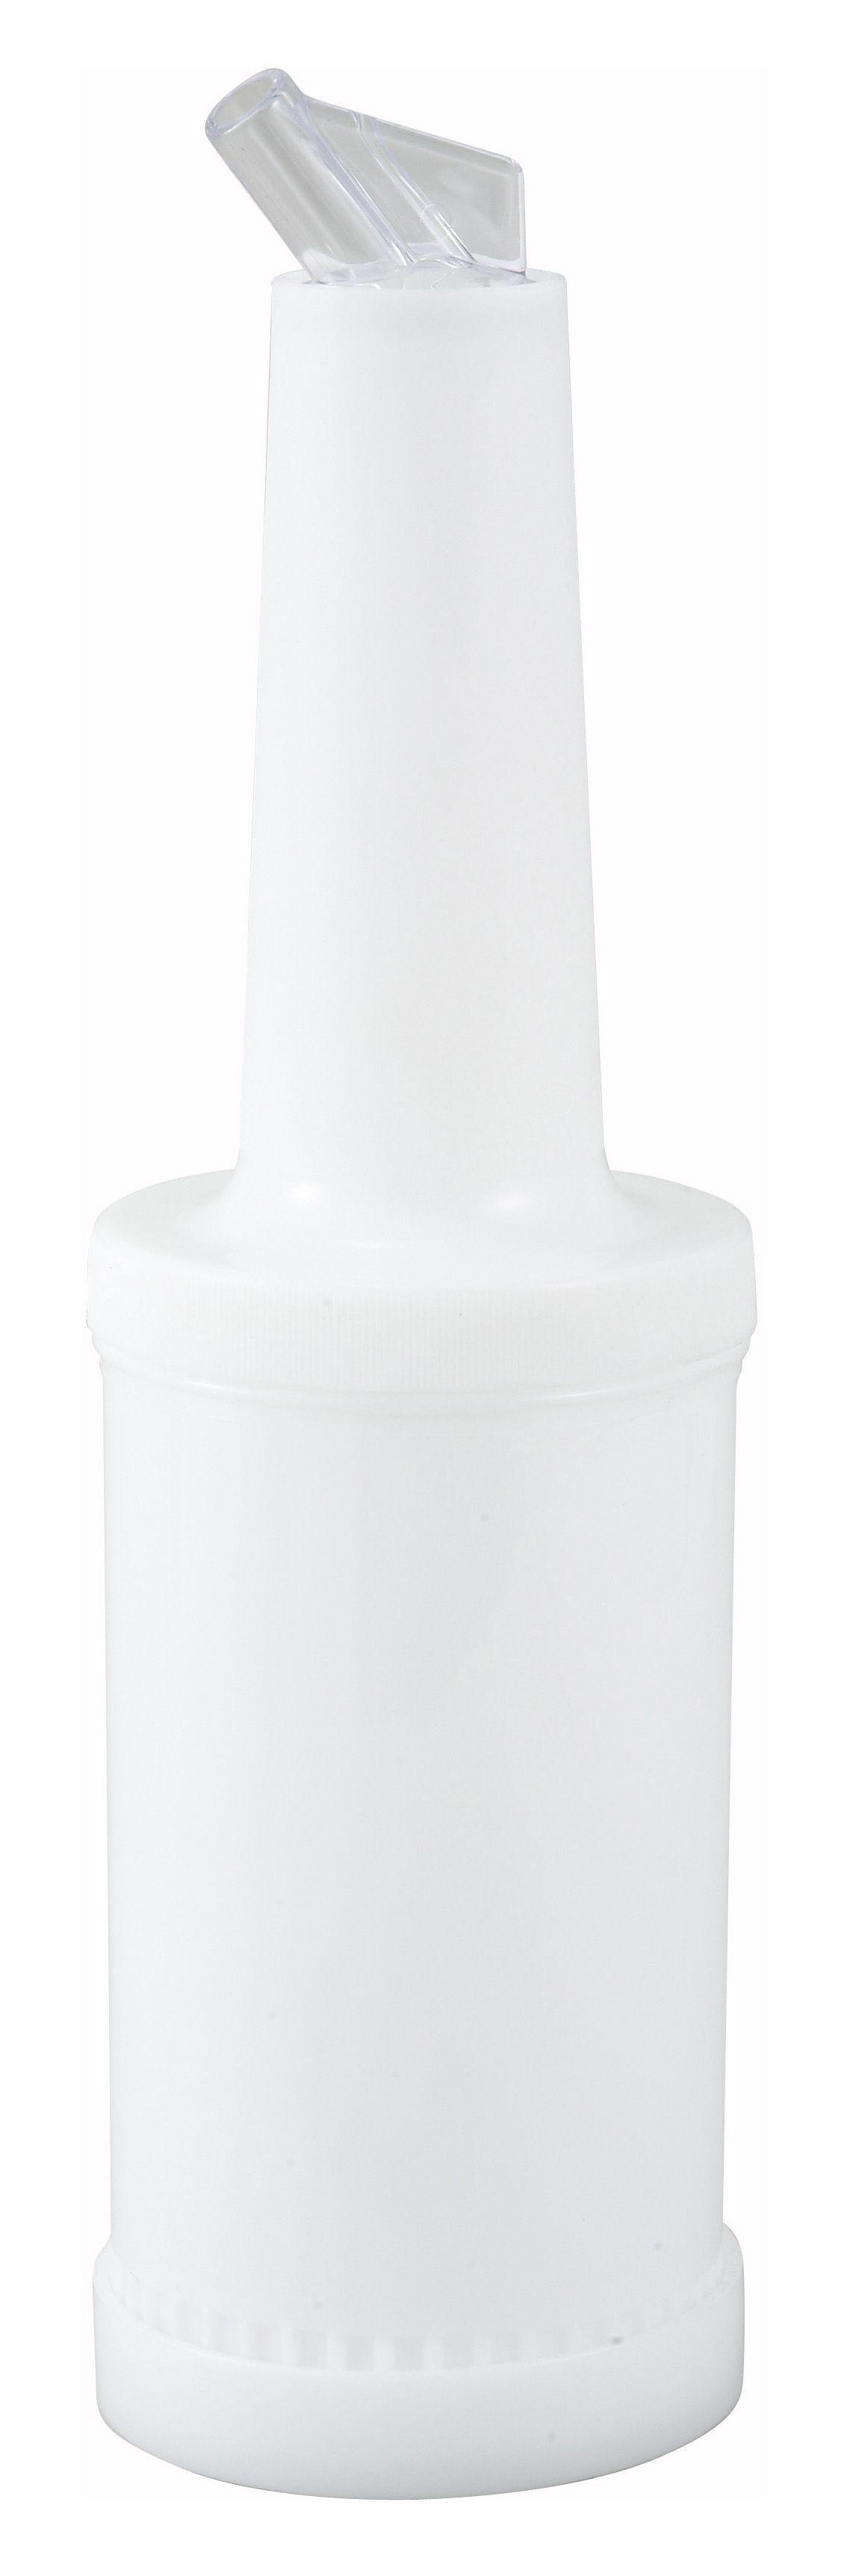 Winco PPB-1W Liquor and Juice Multi-Pour Bottle with White Spout and Lid 1 Qt.